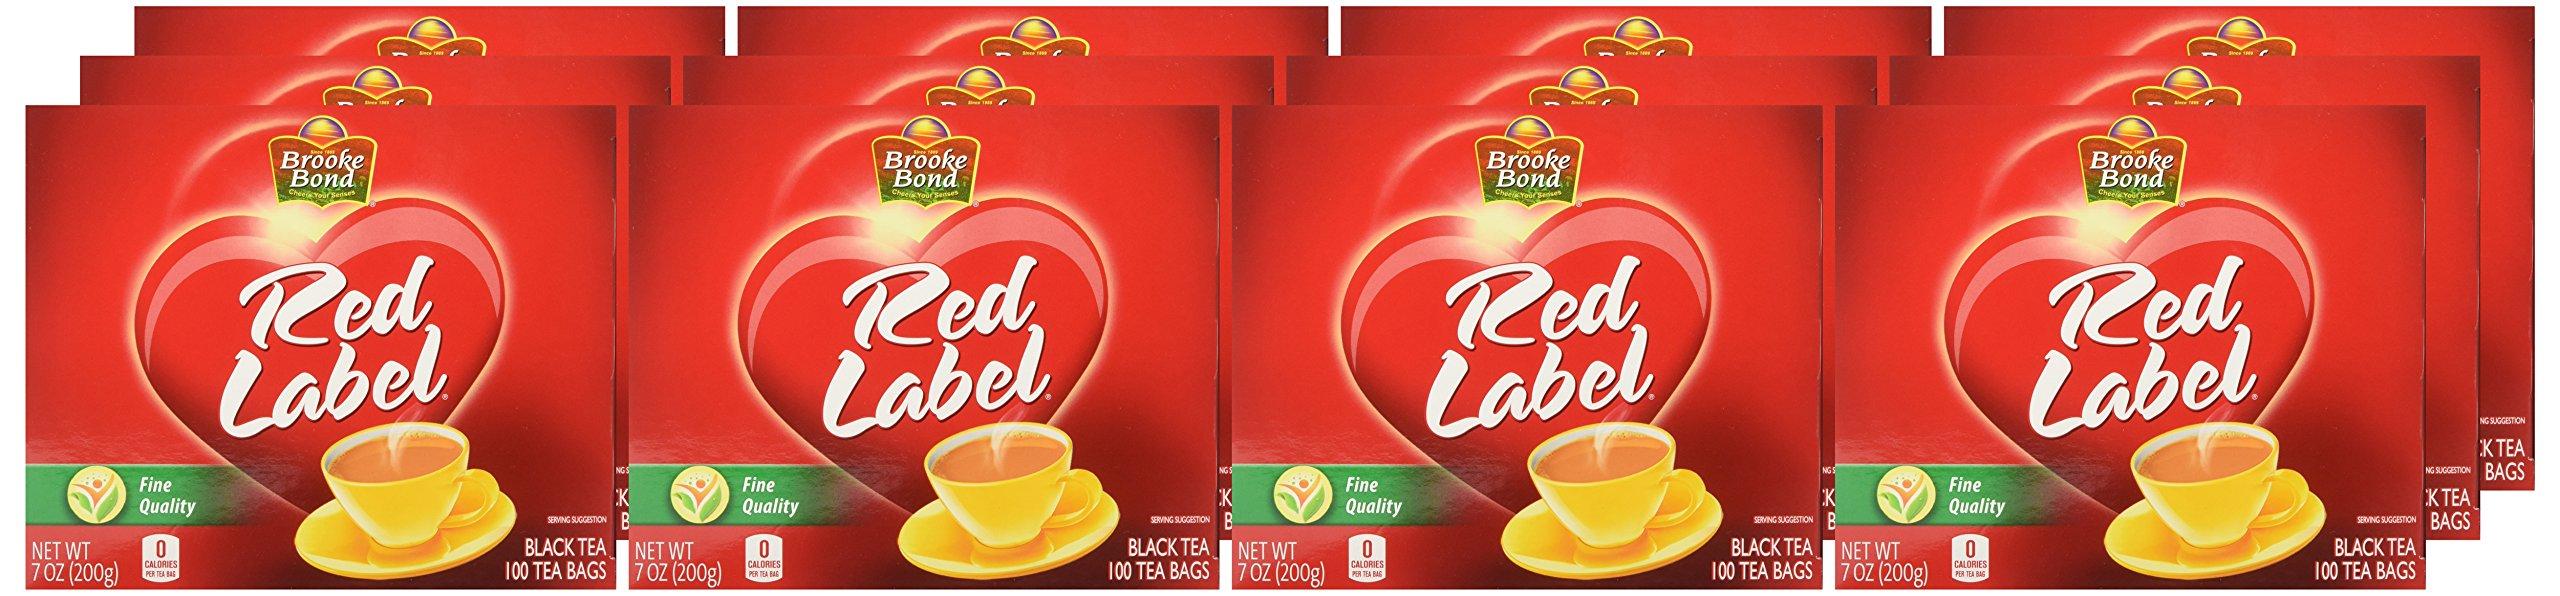 Brooke Bond Red Label Tea Bags, 100 Count (Pack Of 12) by Brooke Bond (Image #2)